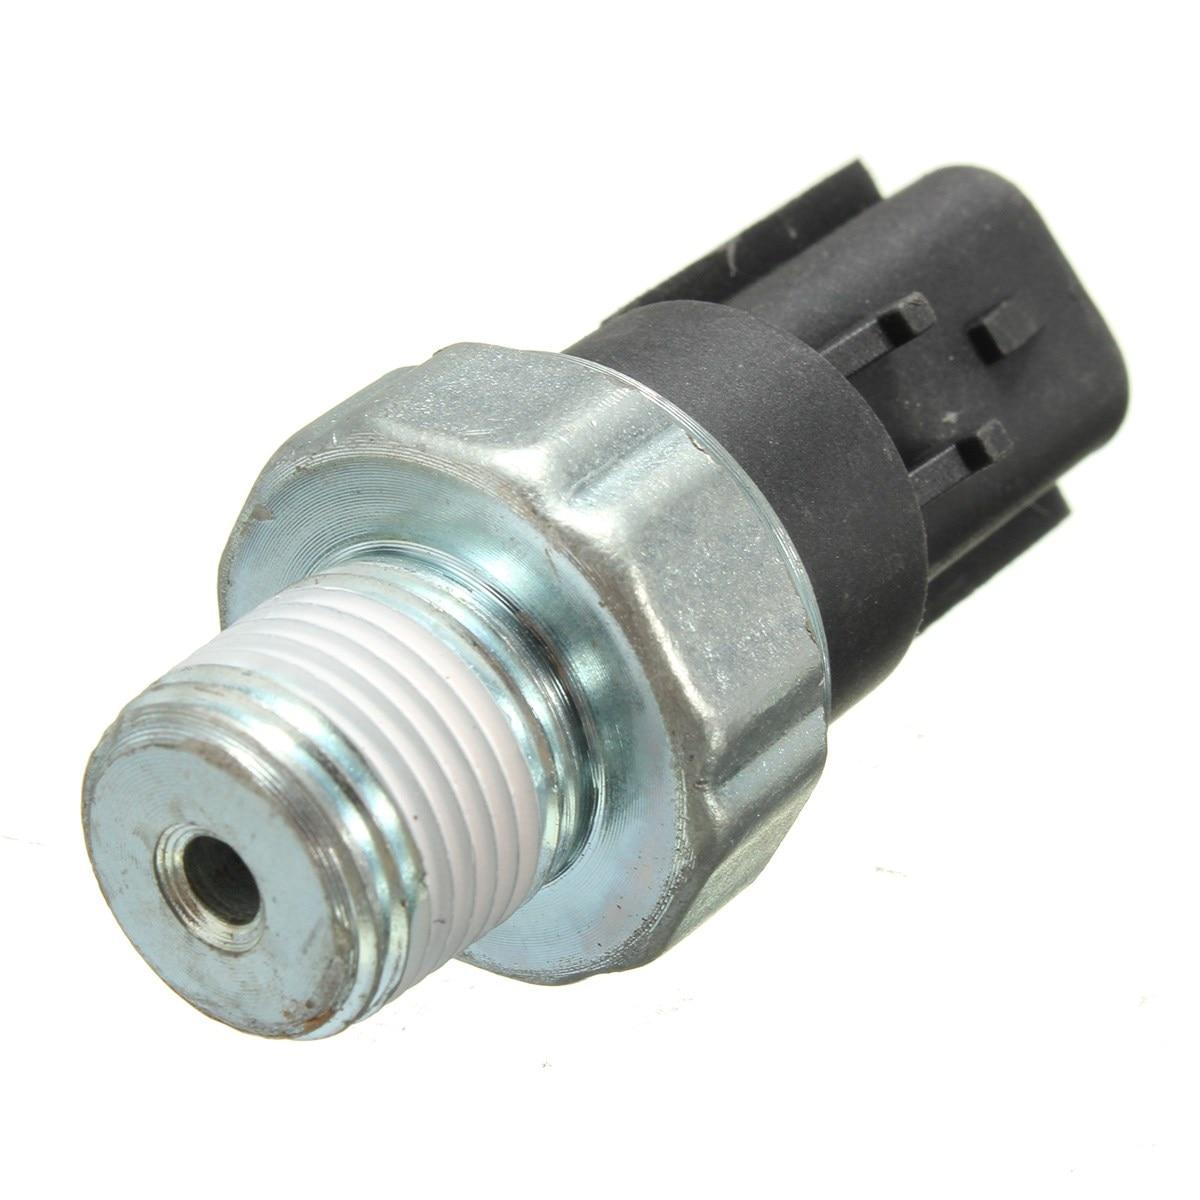 medium resolution of car auto engine oil pressure sensor switch for chrysler dodge jeep ps287